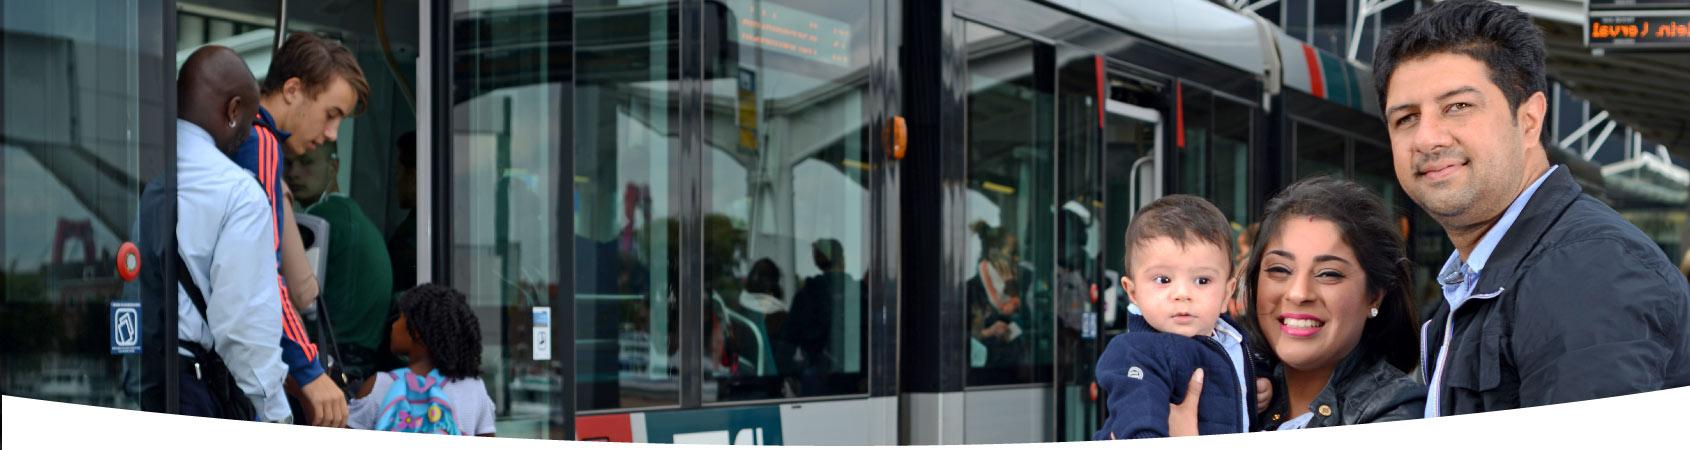 Gezin in Rotterdam wacht op de tram